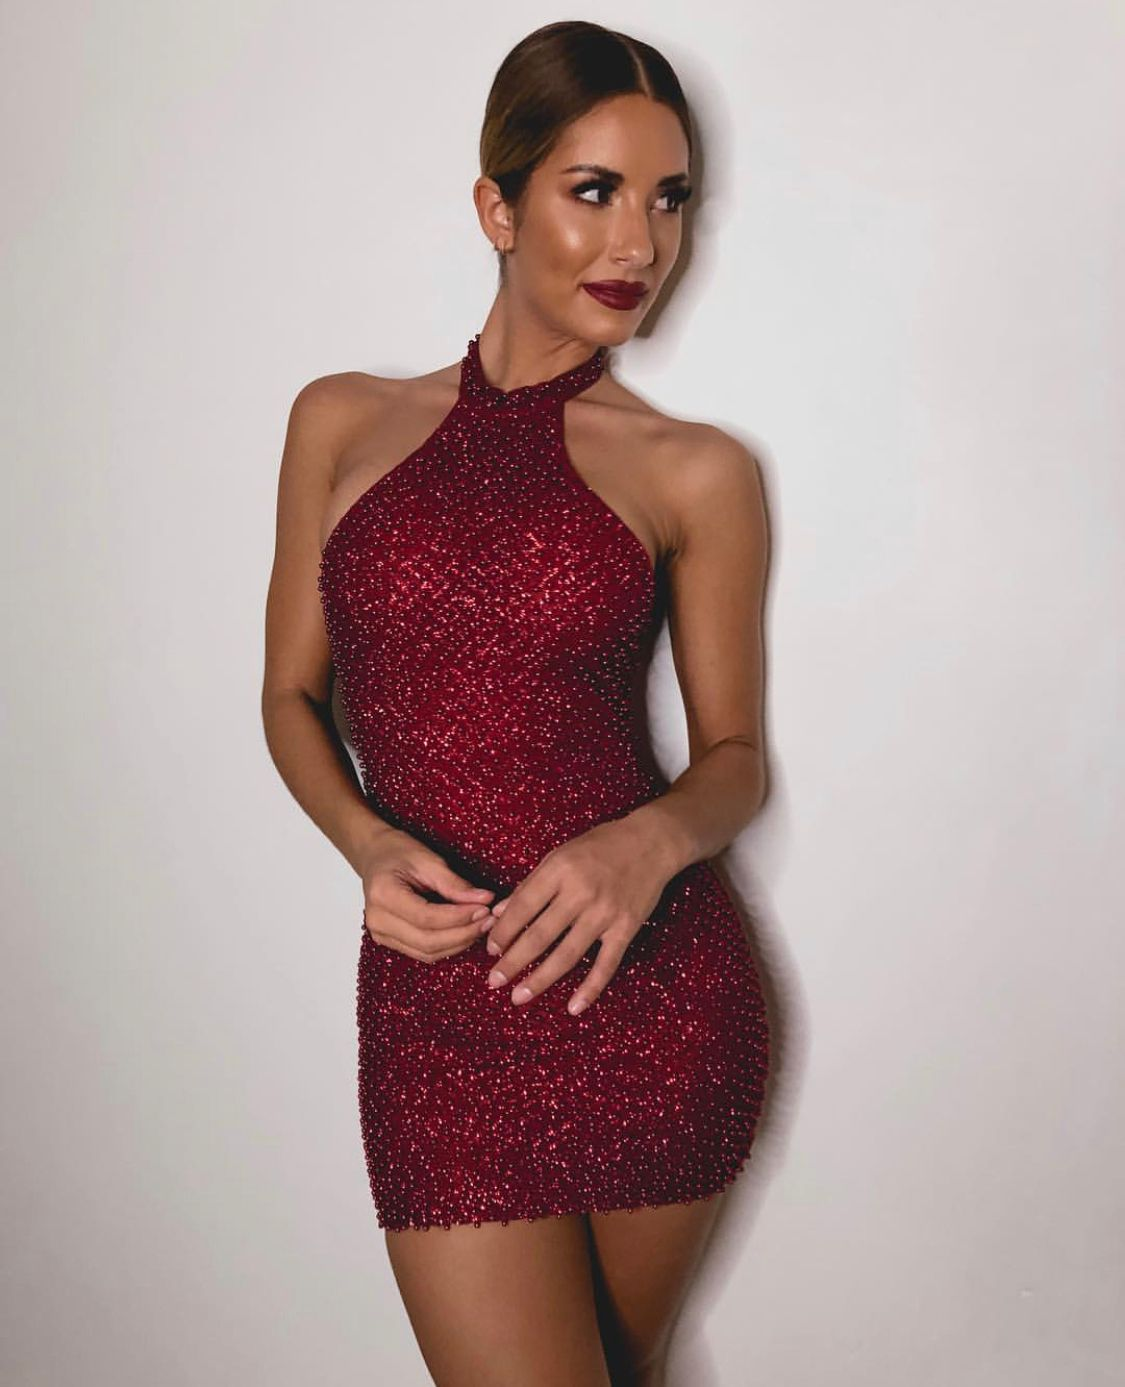 4fef32e8 Oh Polly | #havoolo #fashion #ootd #love #instafashion #fashionblogger  #fashionista #outfit #instastyle #stylish #outfitoftheday #beautiful  #beauty #model ...